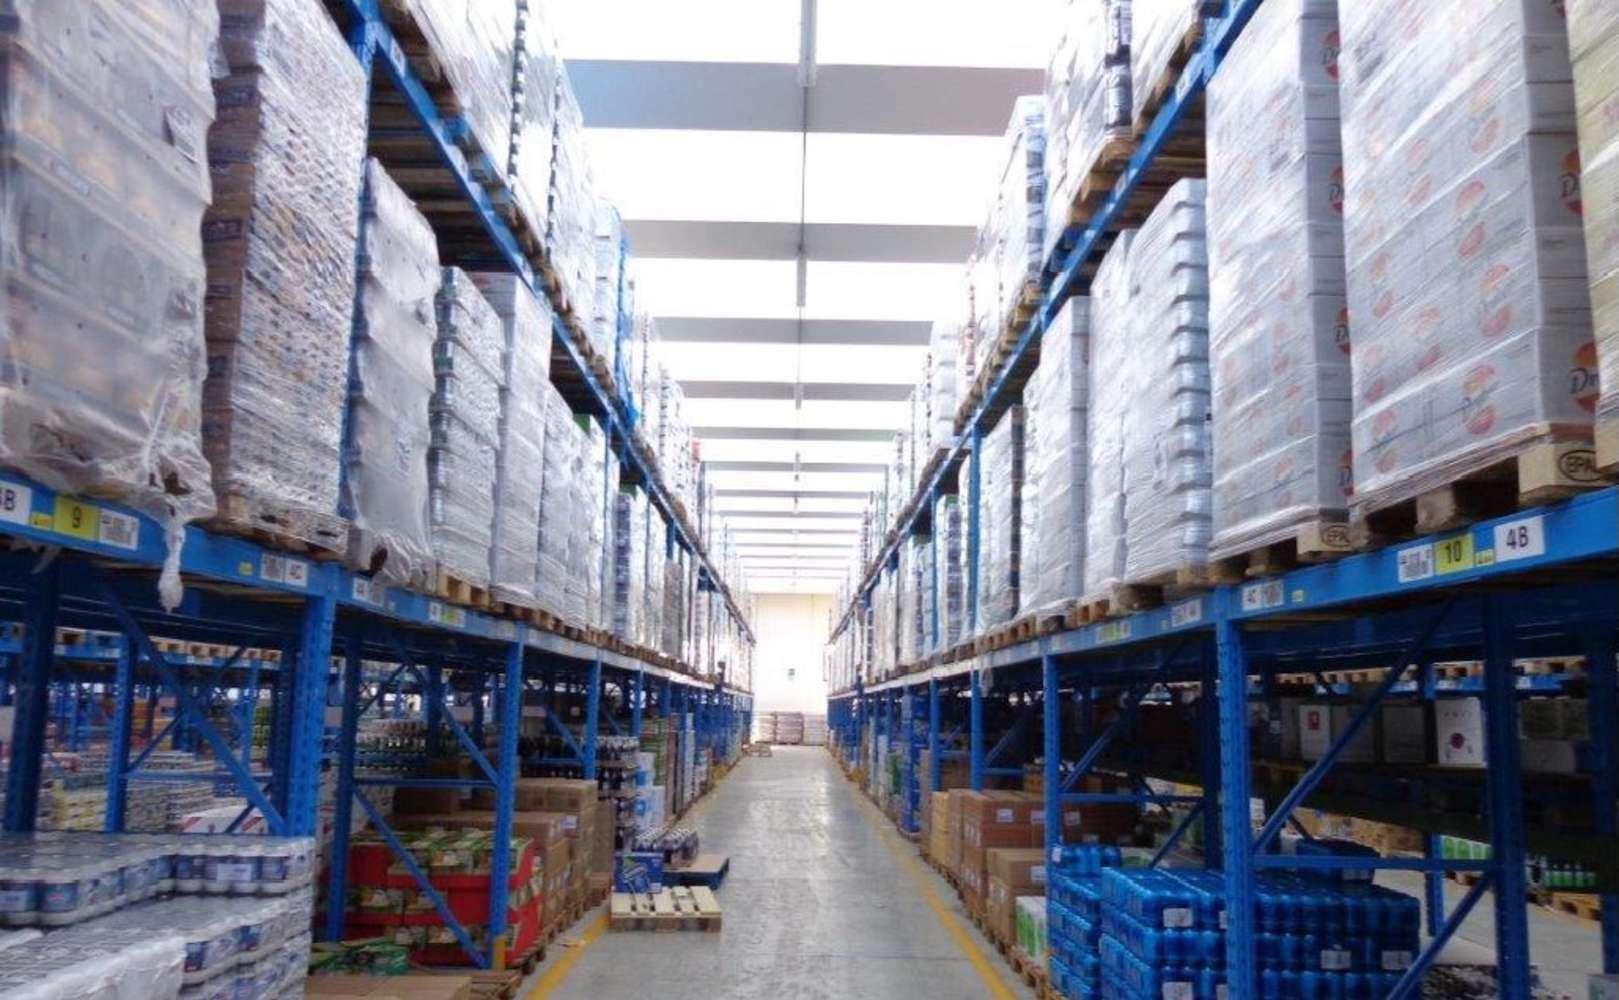 Magazzini industriali e logistici Mozzecane, 37060 - Mozzecane magazzini logistici - 10926881